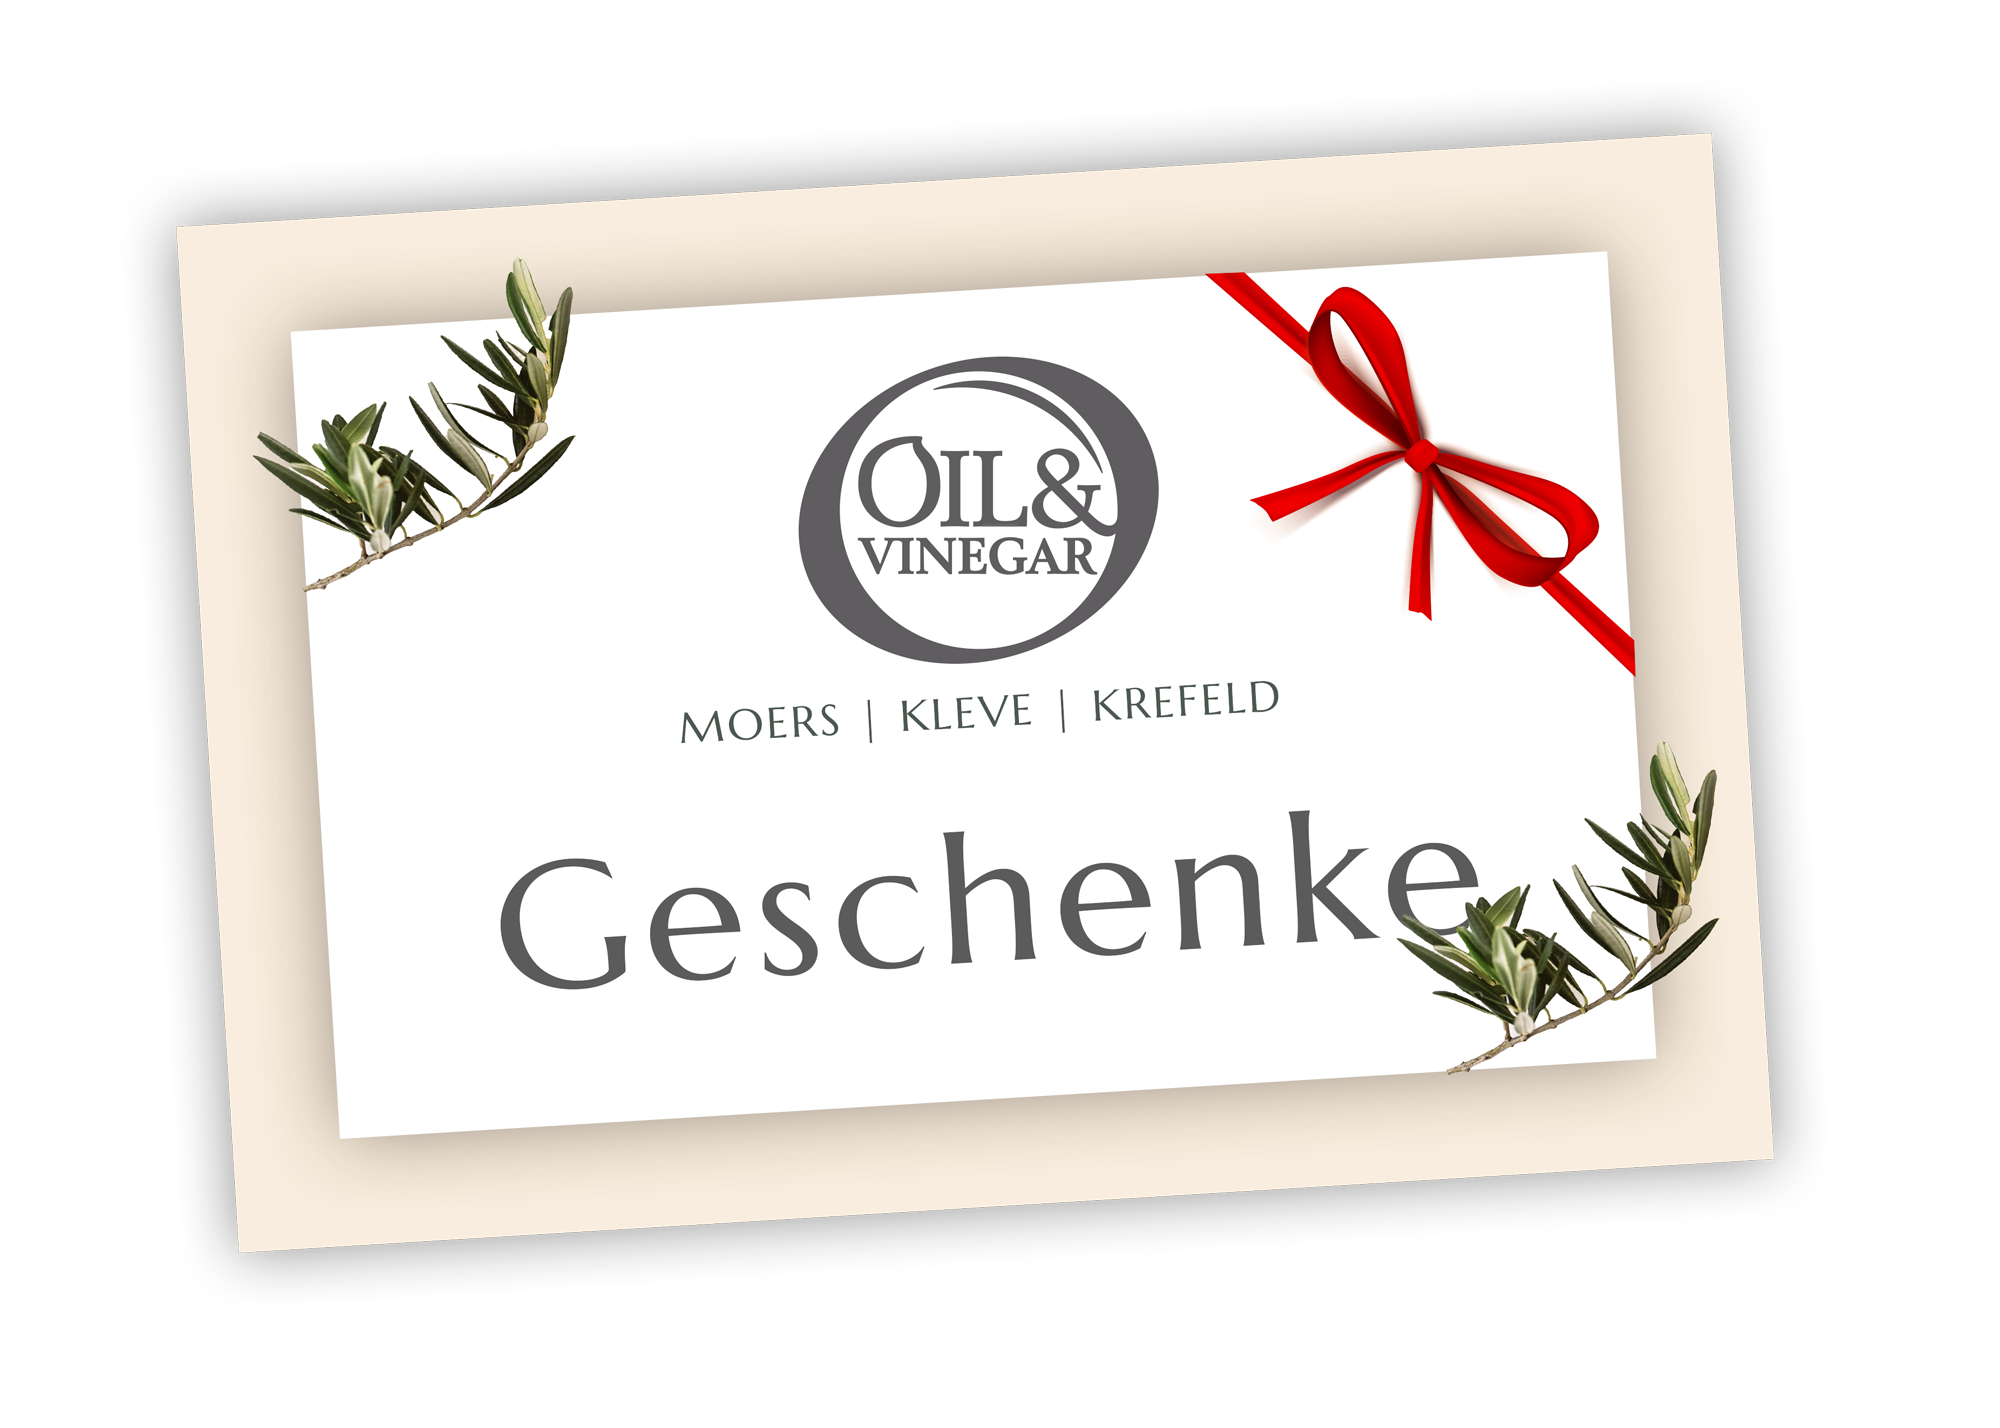 oil-and-vinegar-kulinarische-geschenke-eihnschtsgeschenke-firma-geschenk-geschaeftspartner-geschenk-fresslorb-geburtstag-online-shop-bestellen